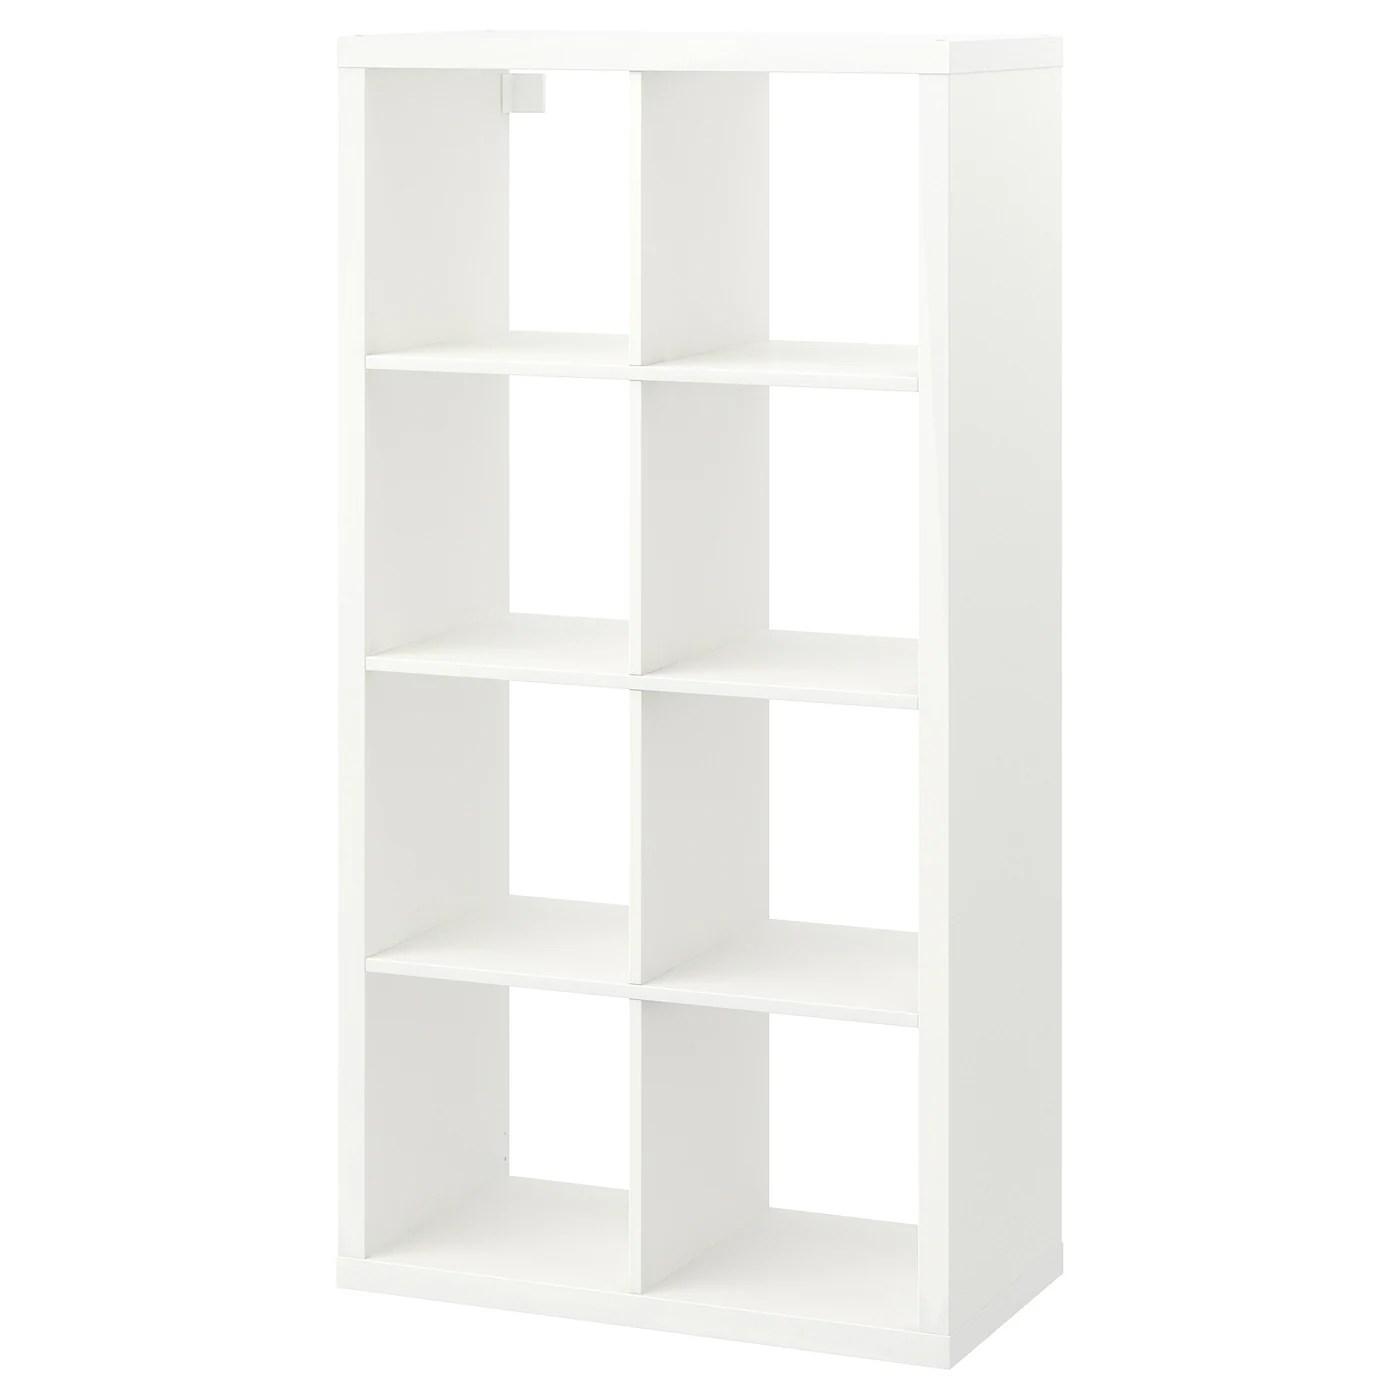 Shelves Cube Storage Organizers Ikea